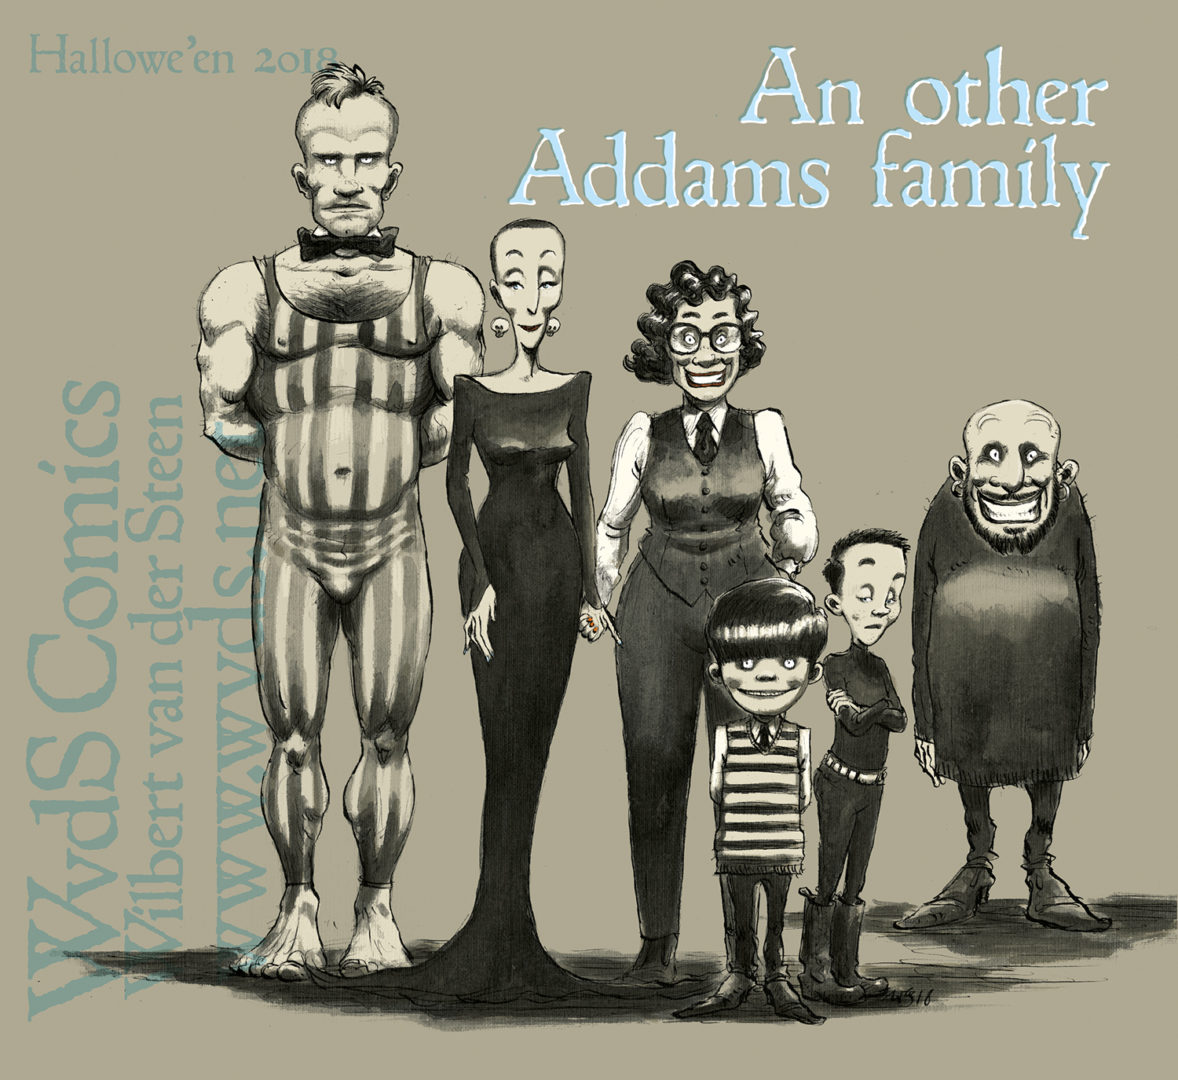 An other Addams Family. Hallowe'en 2018